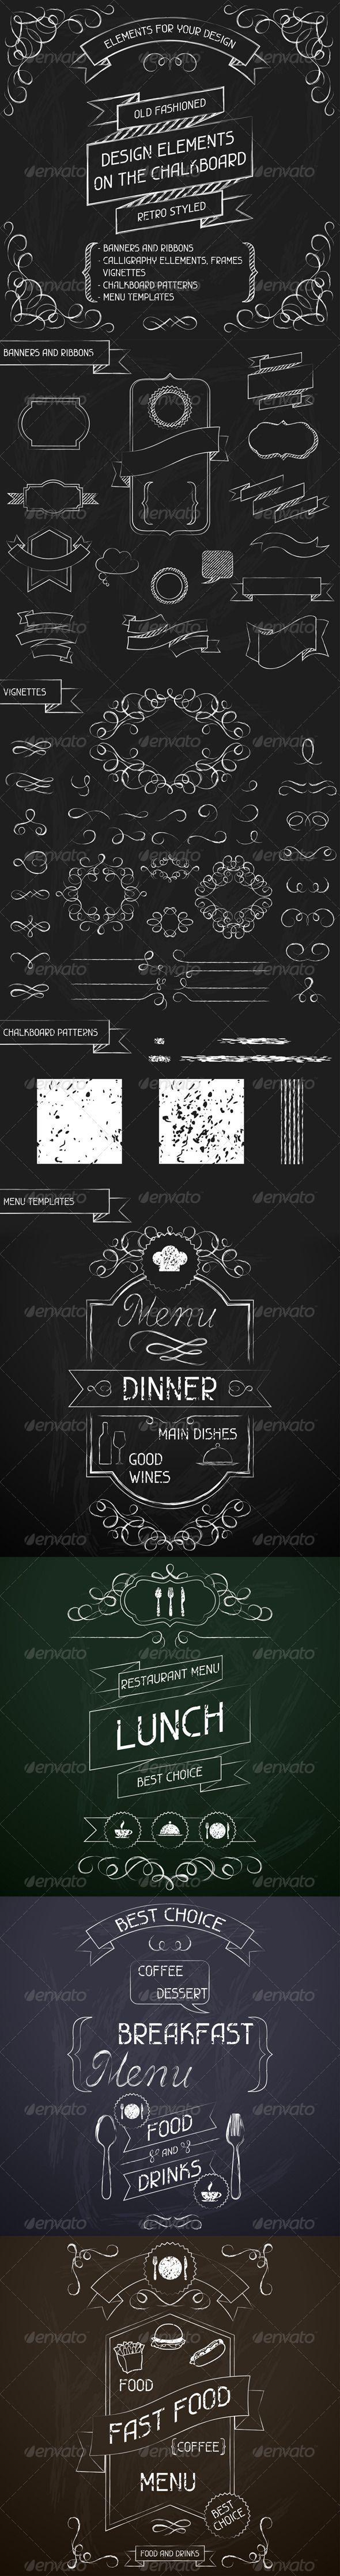 Design Elements on the Chalkboard - Decorative Symbols Decorative: